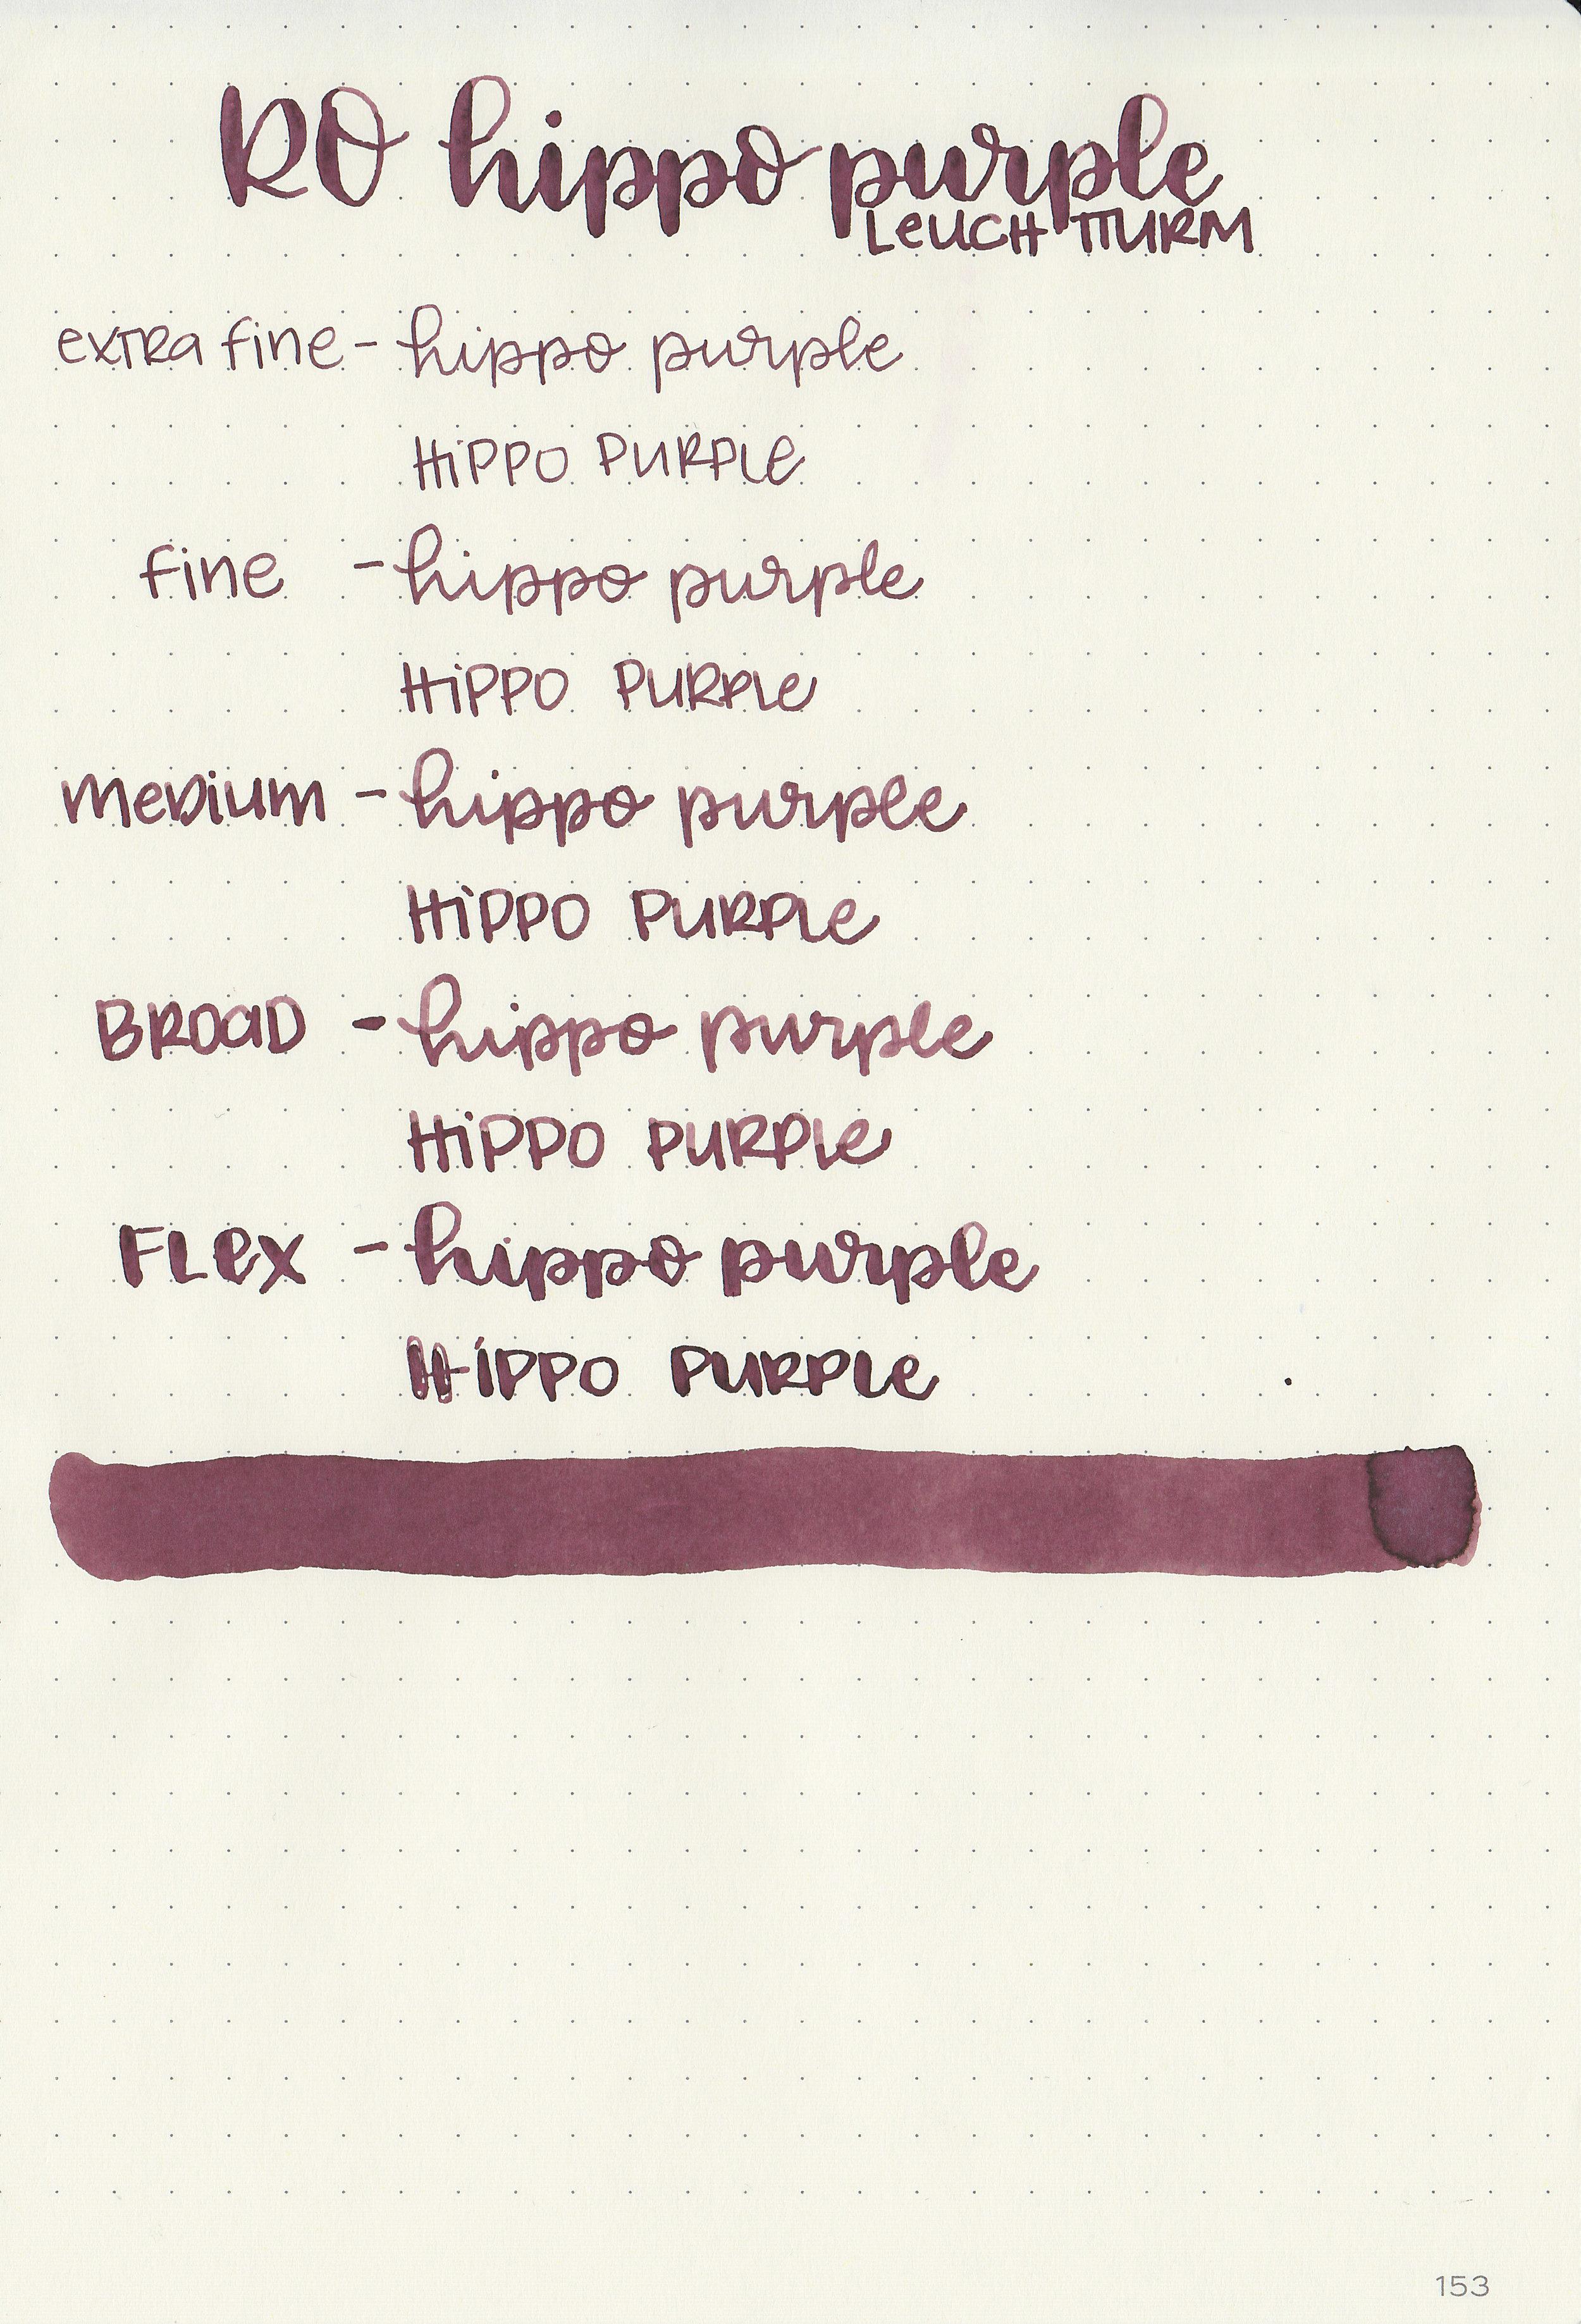 ro-hippo-purple-11.jpg